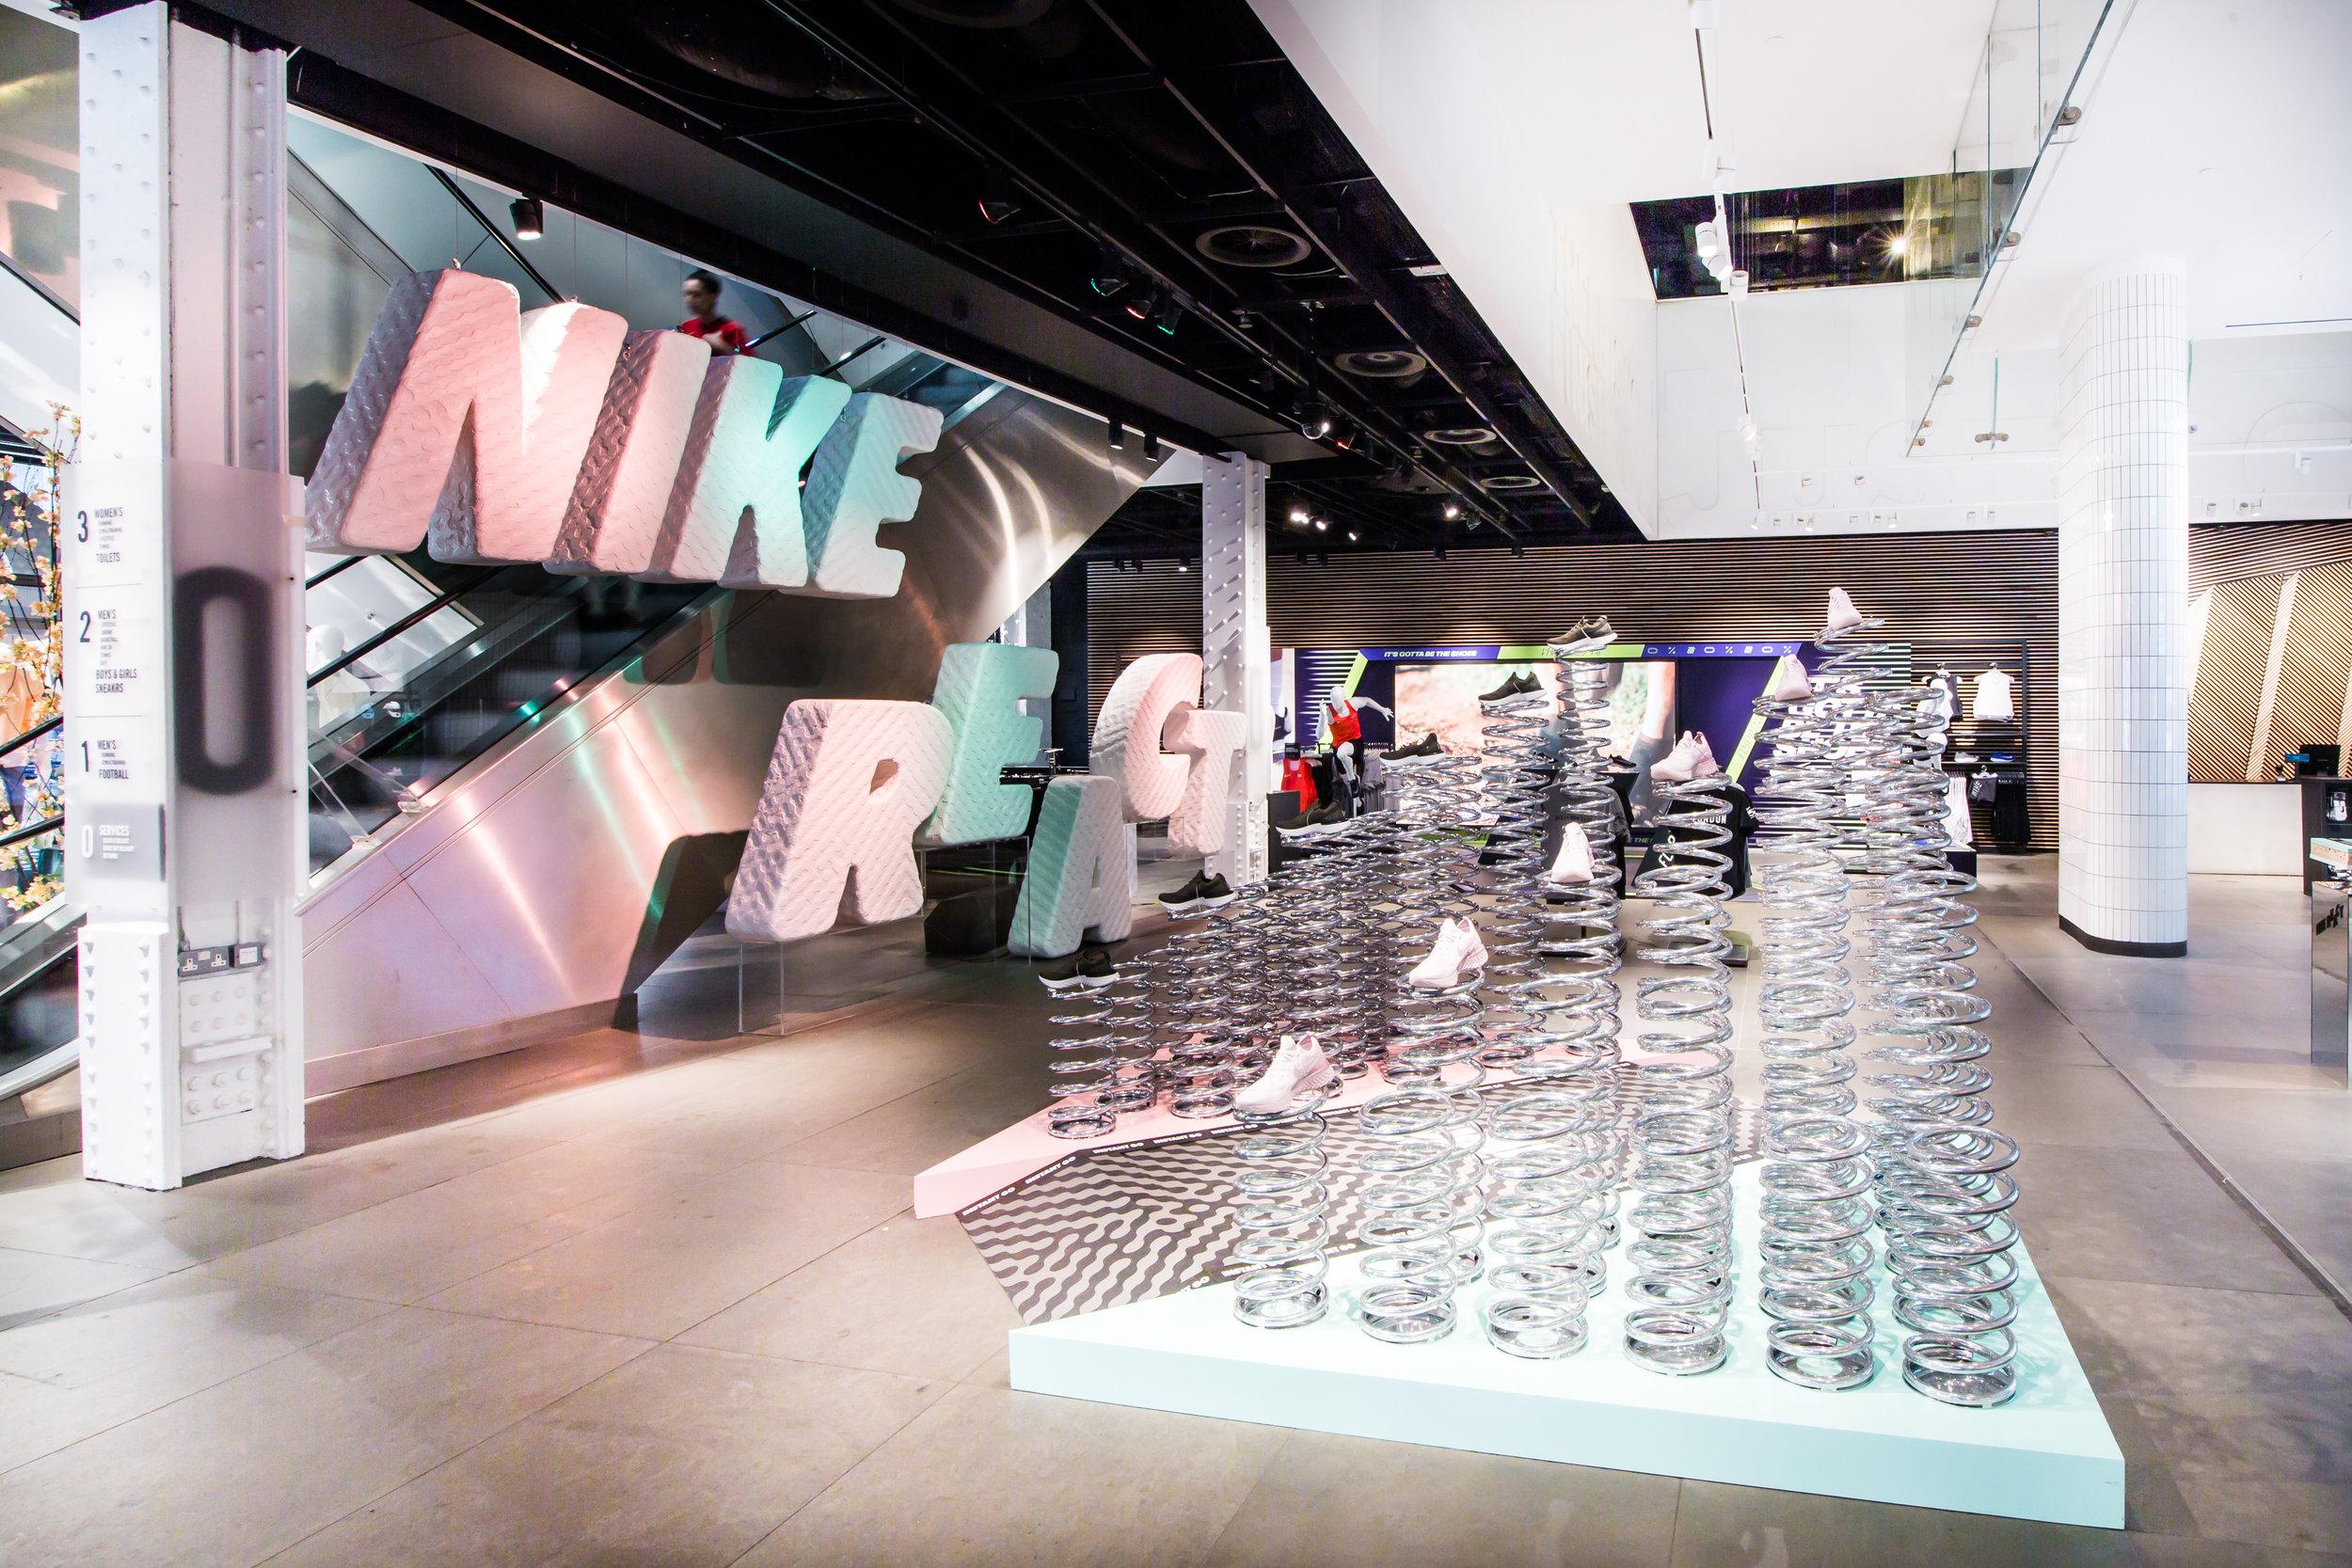 TDM_0685 - Nike - React Pro - NTL - MA Licensing - Tom D Morgan - HIGH RES.jpg